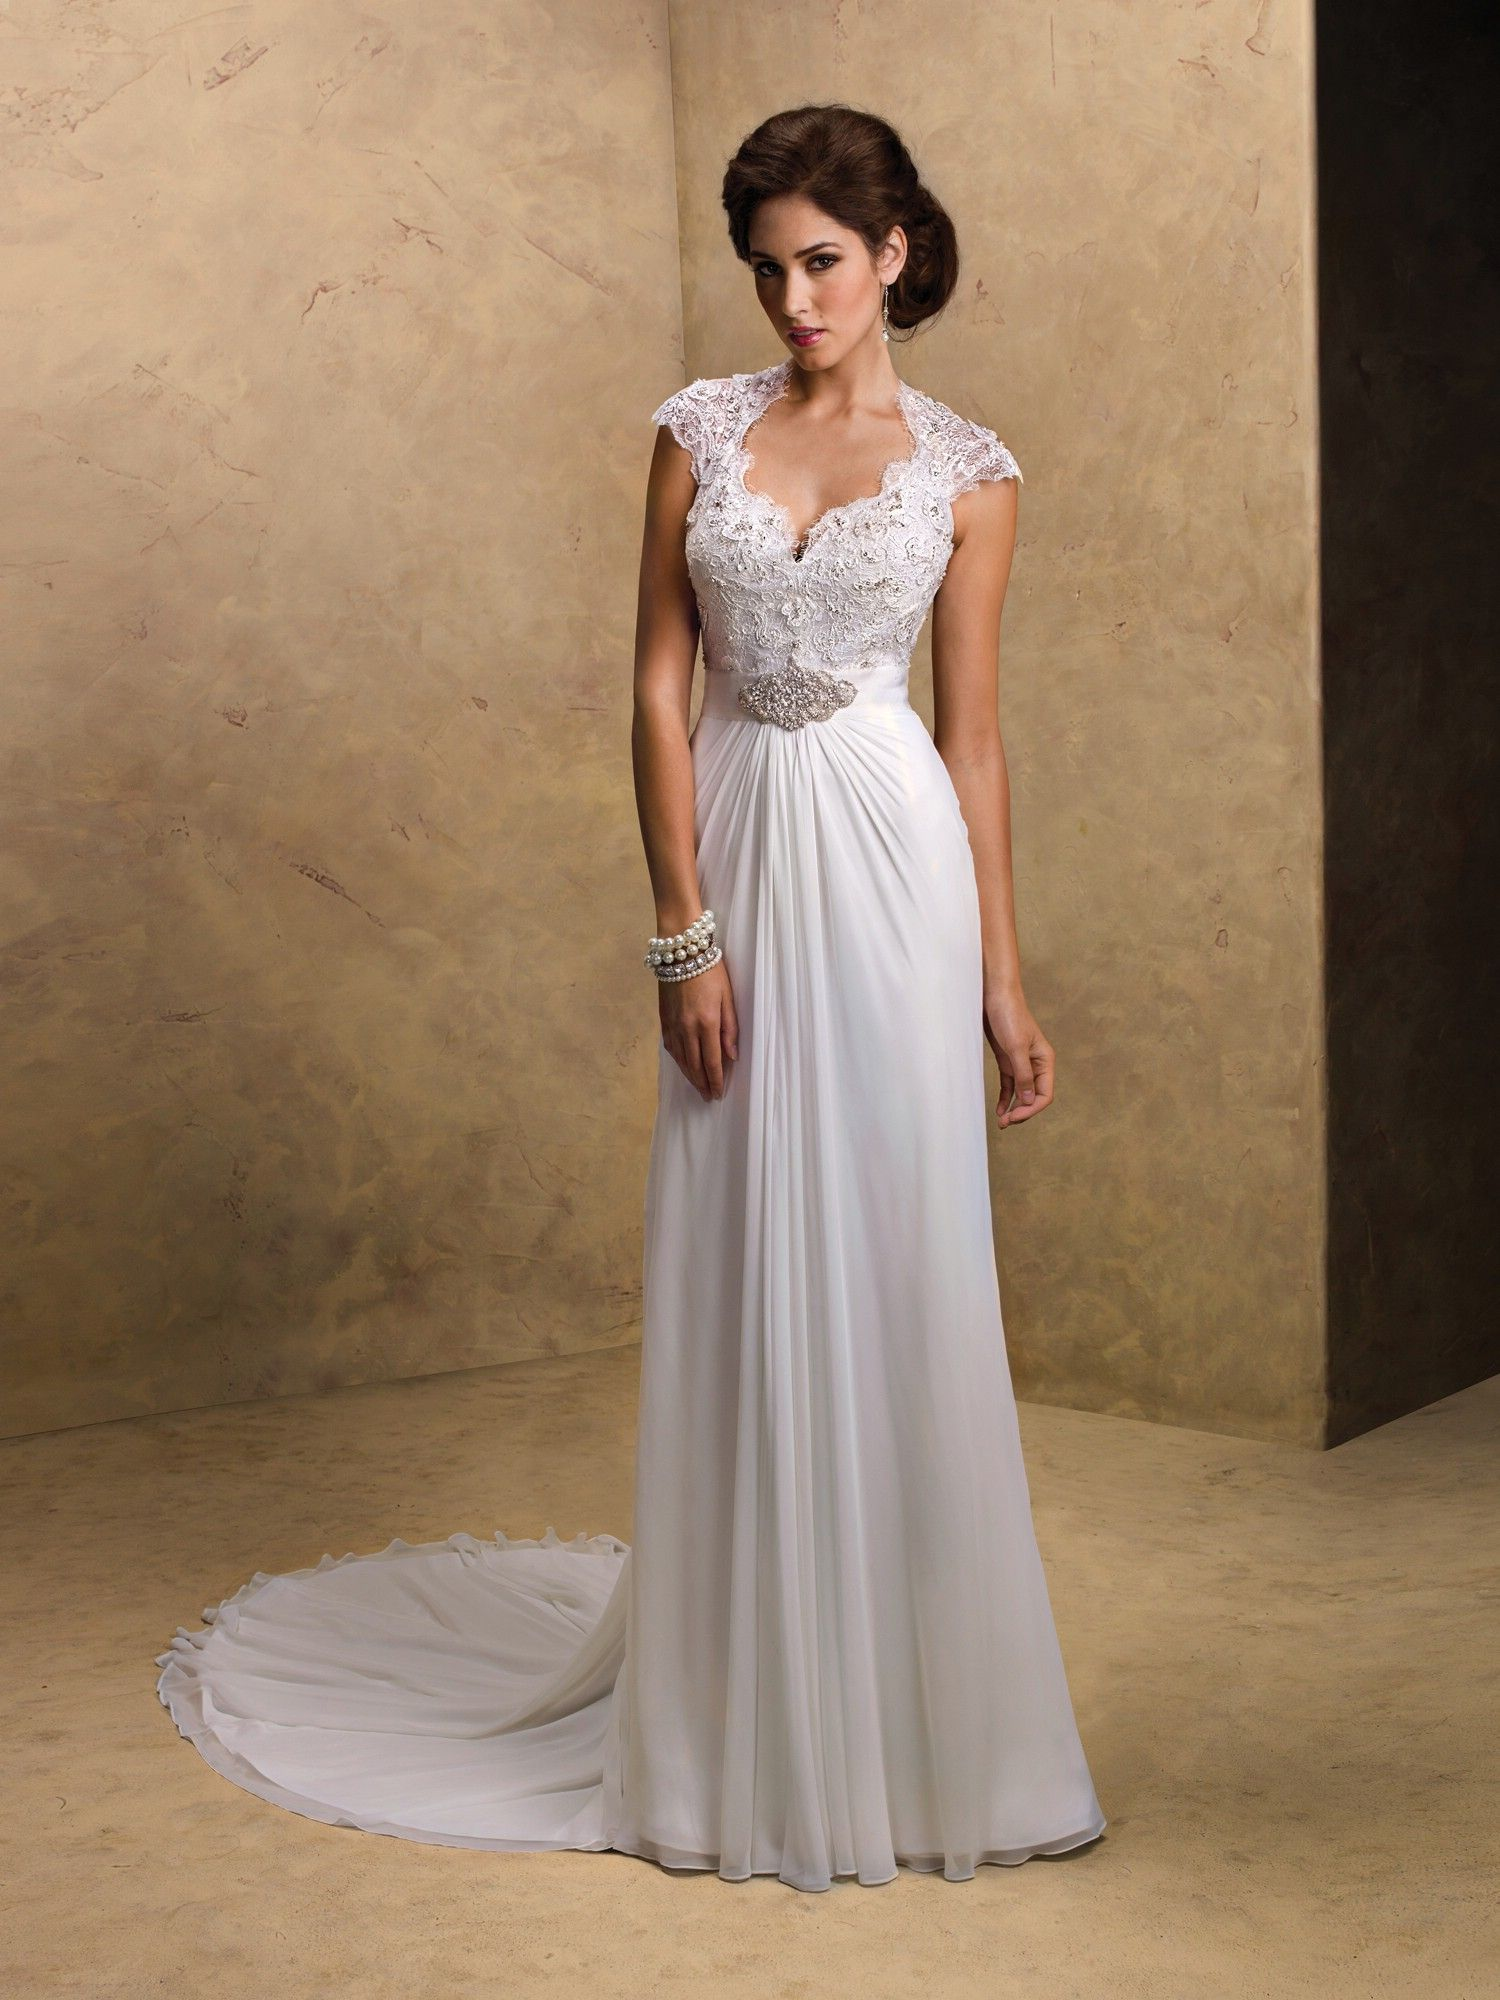 Dress for wedding party female  Maggie Sottero  Jillian  Isnut this just beautiful  Dream